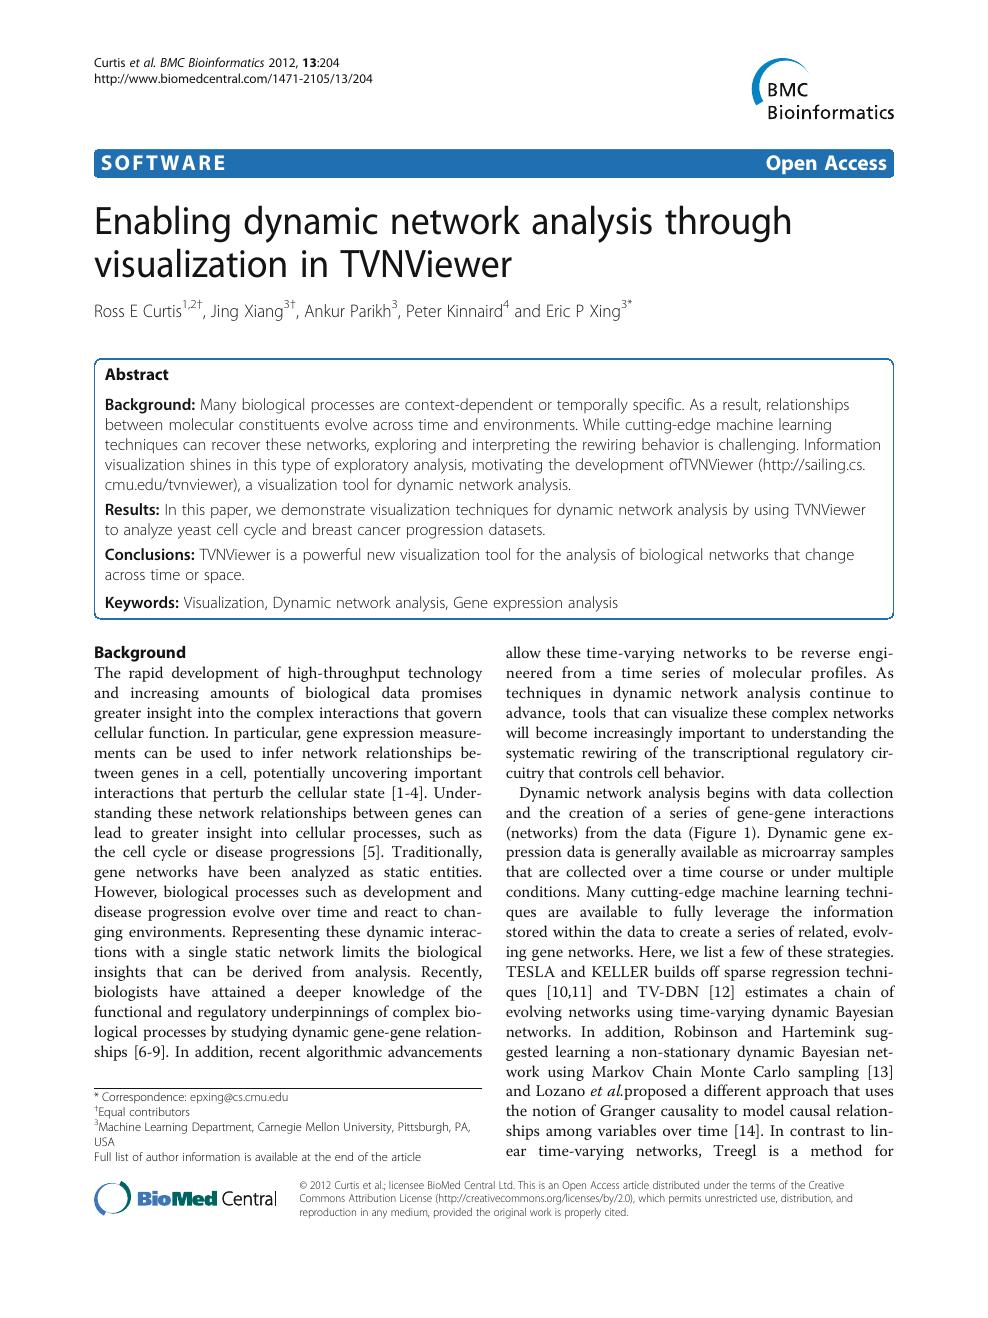 Enabling dynamic network analysis through visualization in